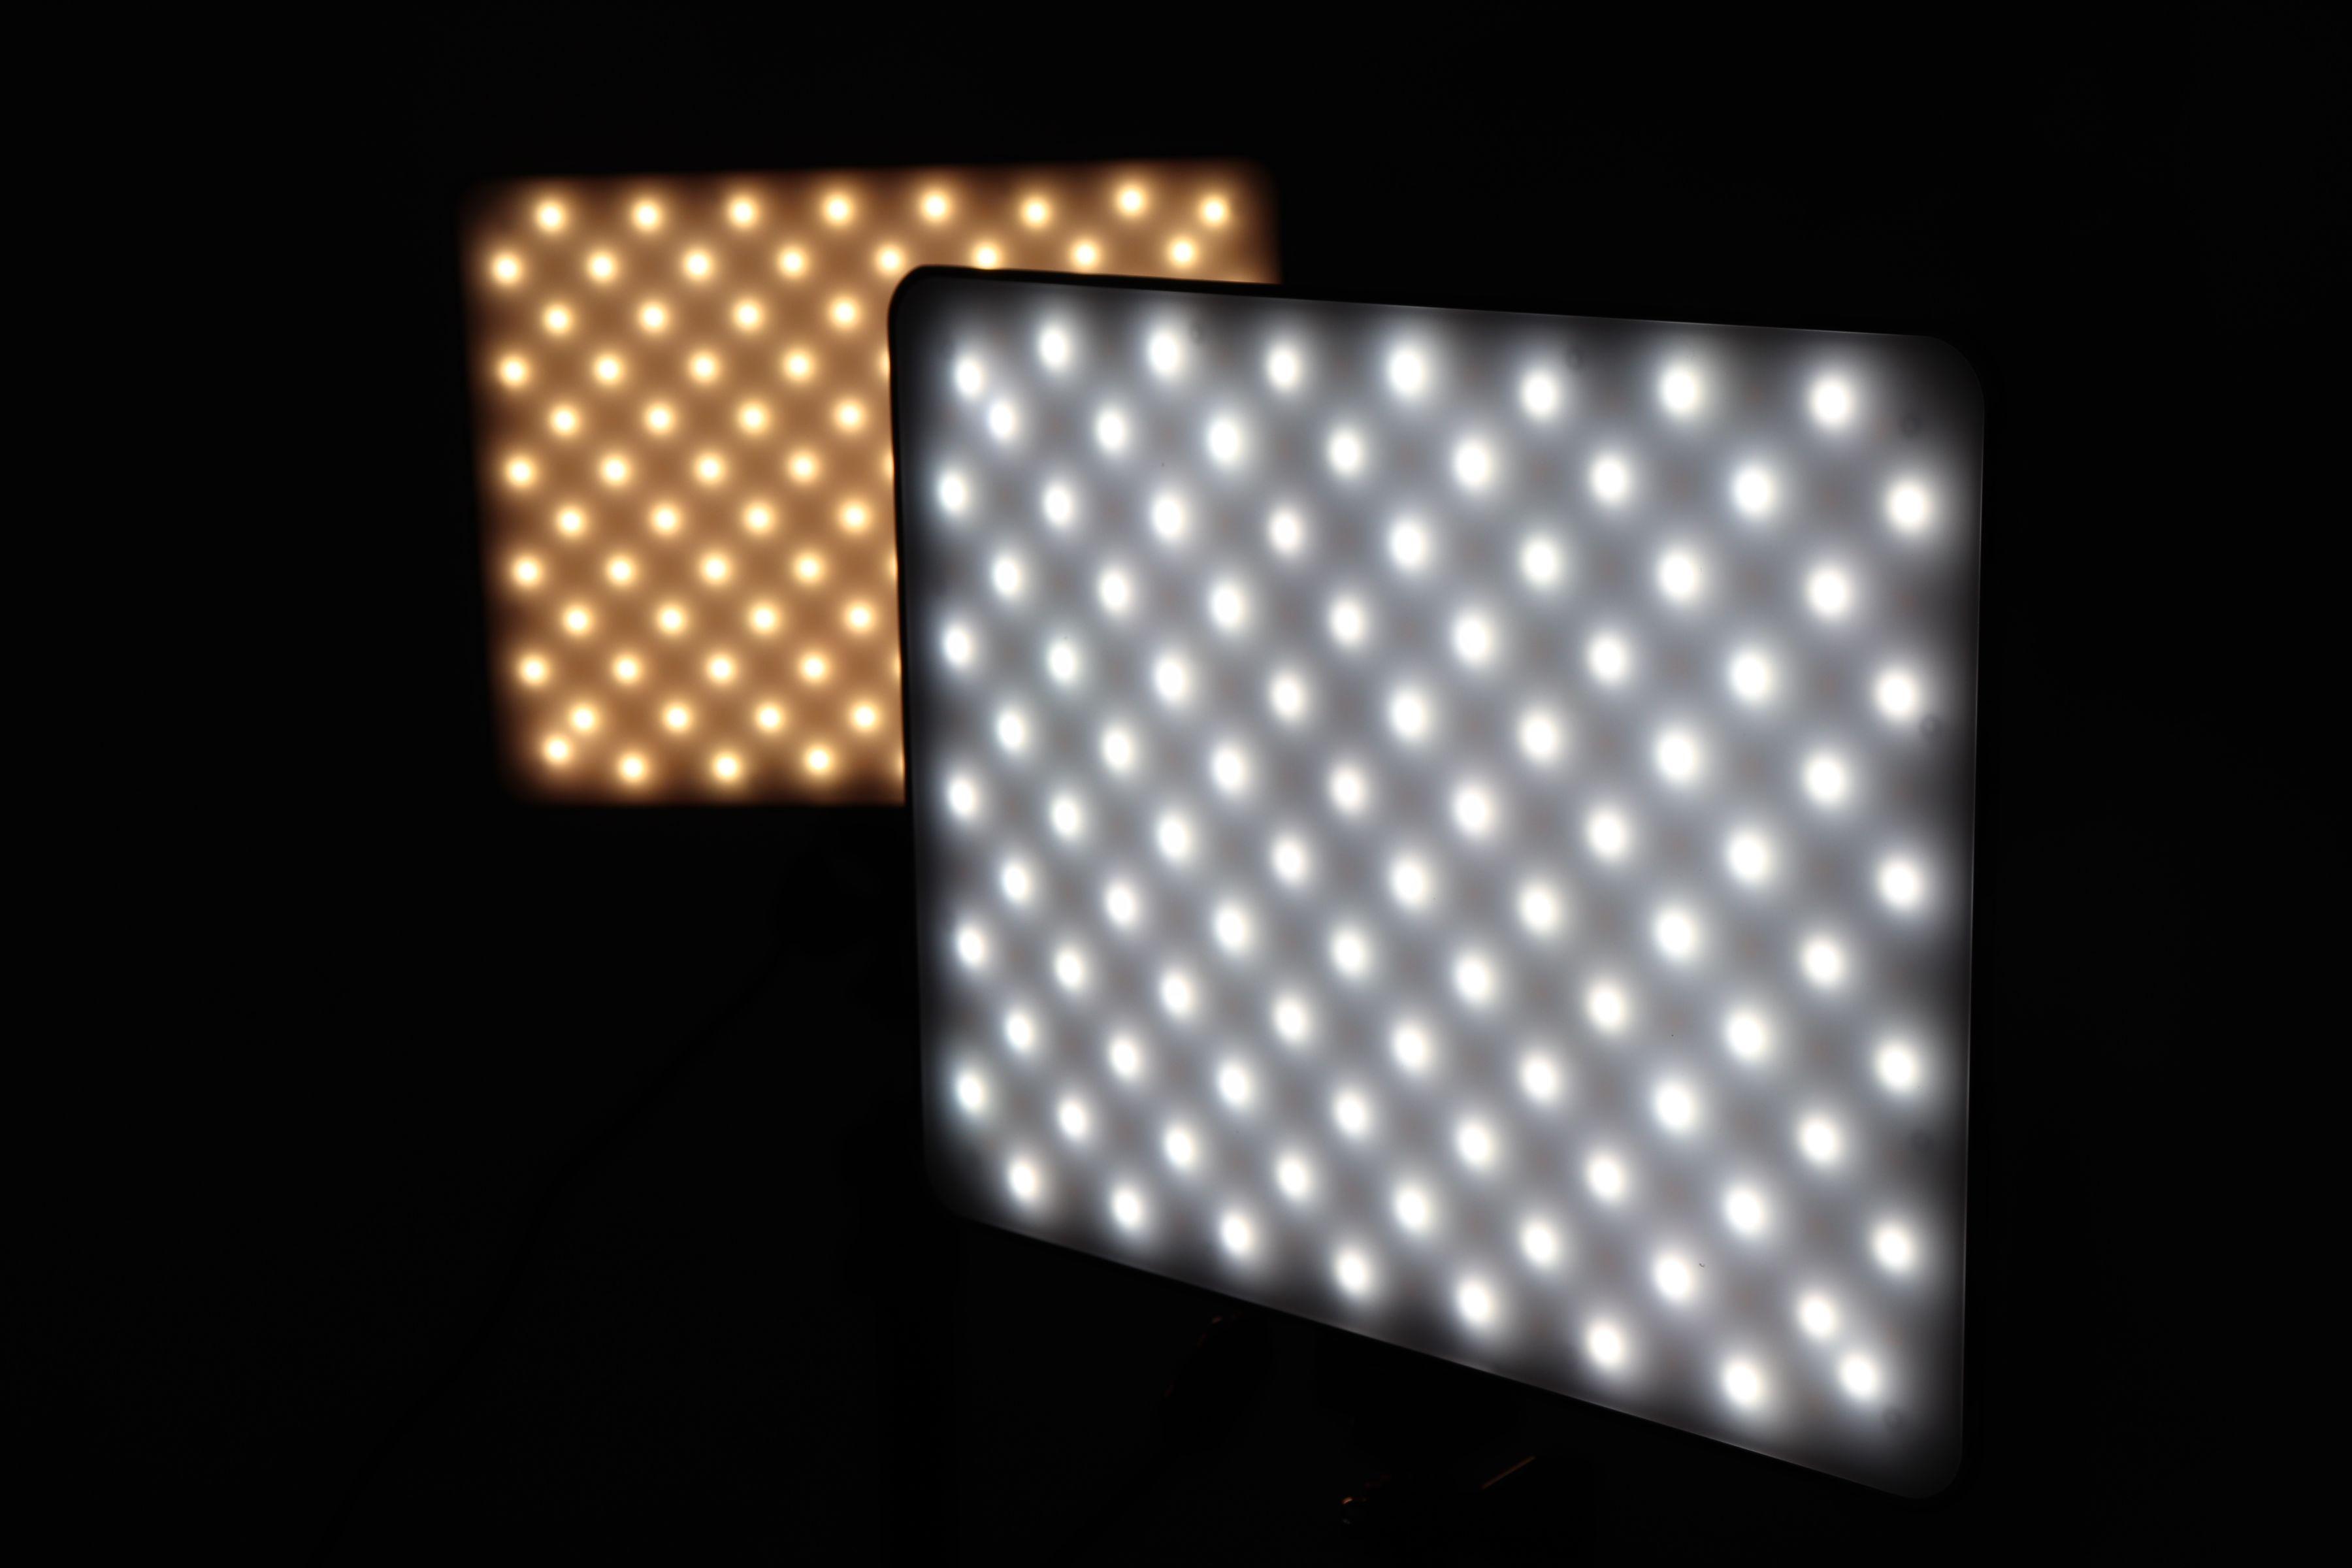 VILTROX-VL-200T-LED-Fotolampen-im-Test